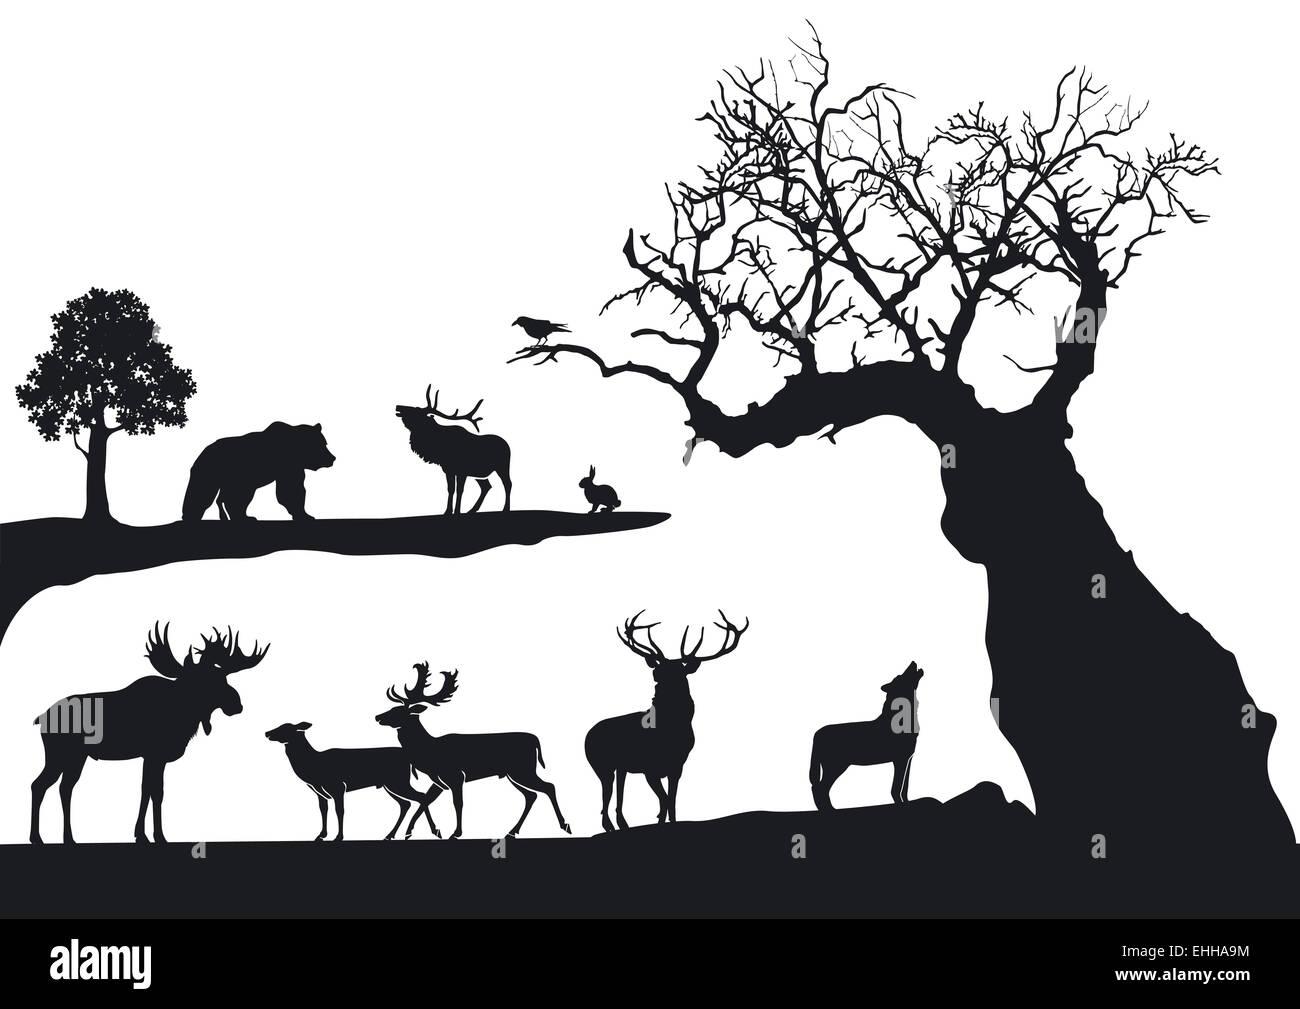 gnarled tree with wildlife isolated on white - Stock Image